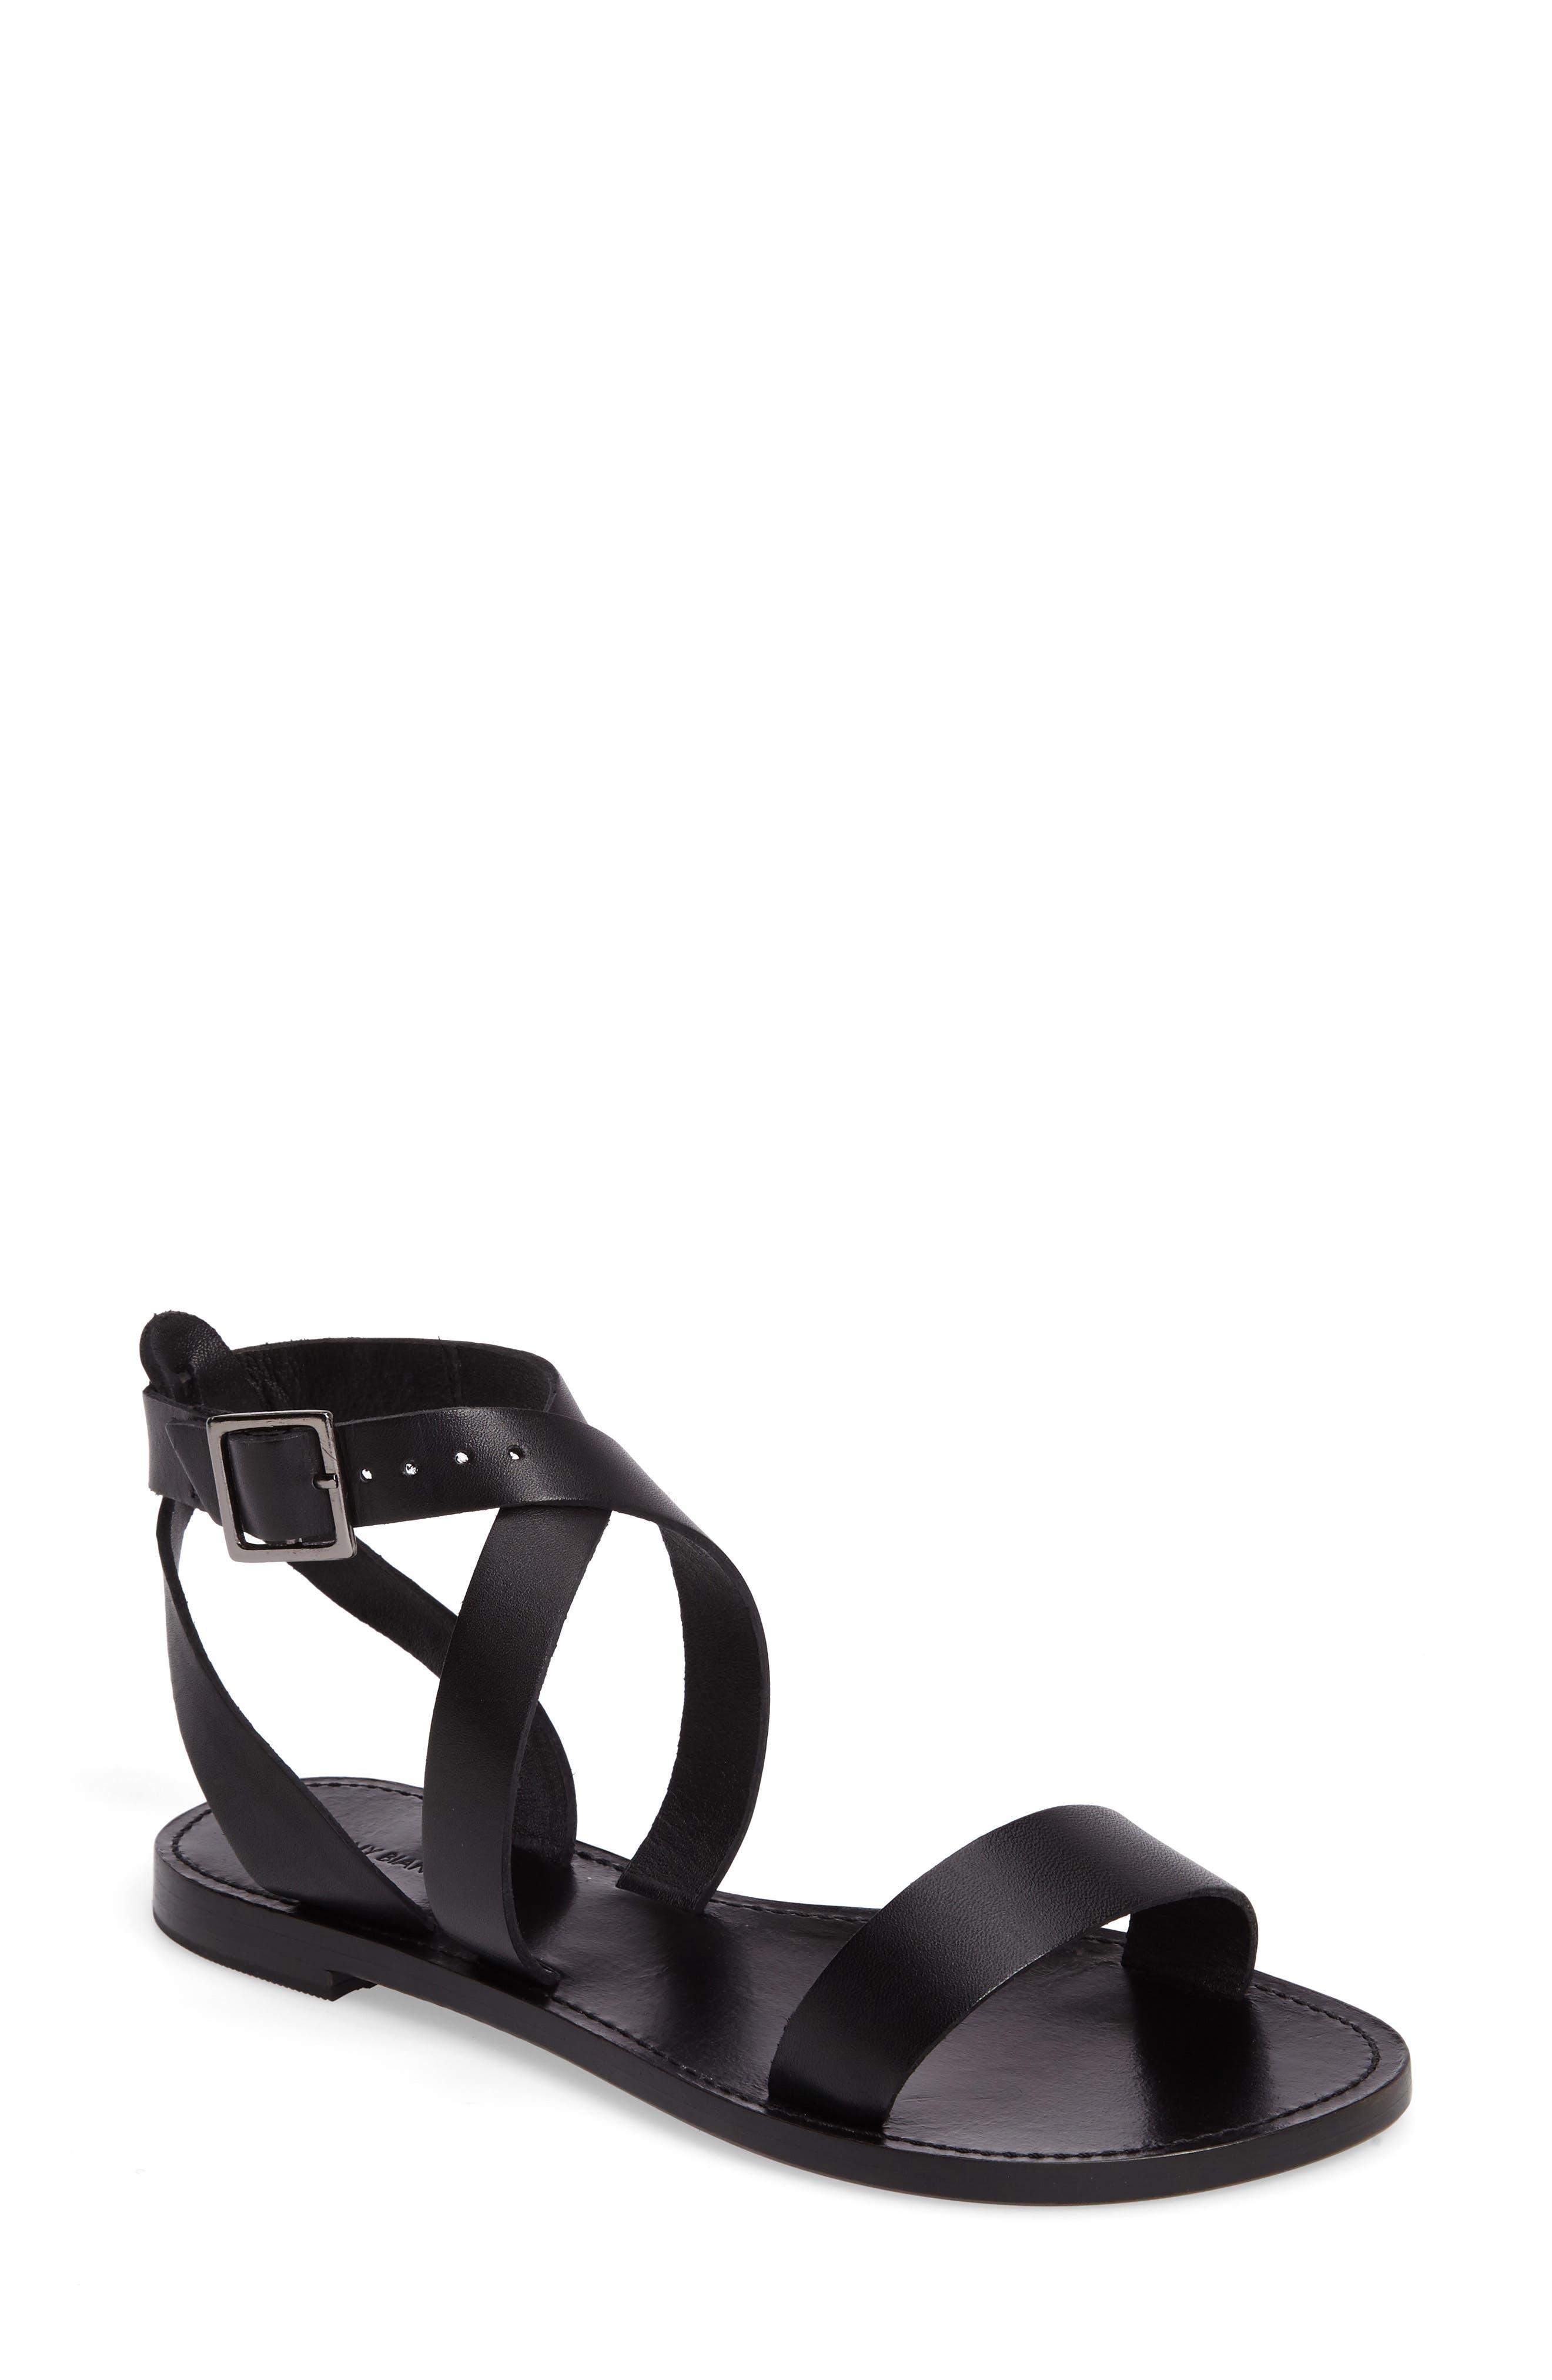 Alternate Image 1 Selected - Tony Bianco Flo Ankle Strap Sandal (Women)